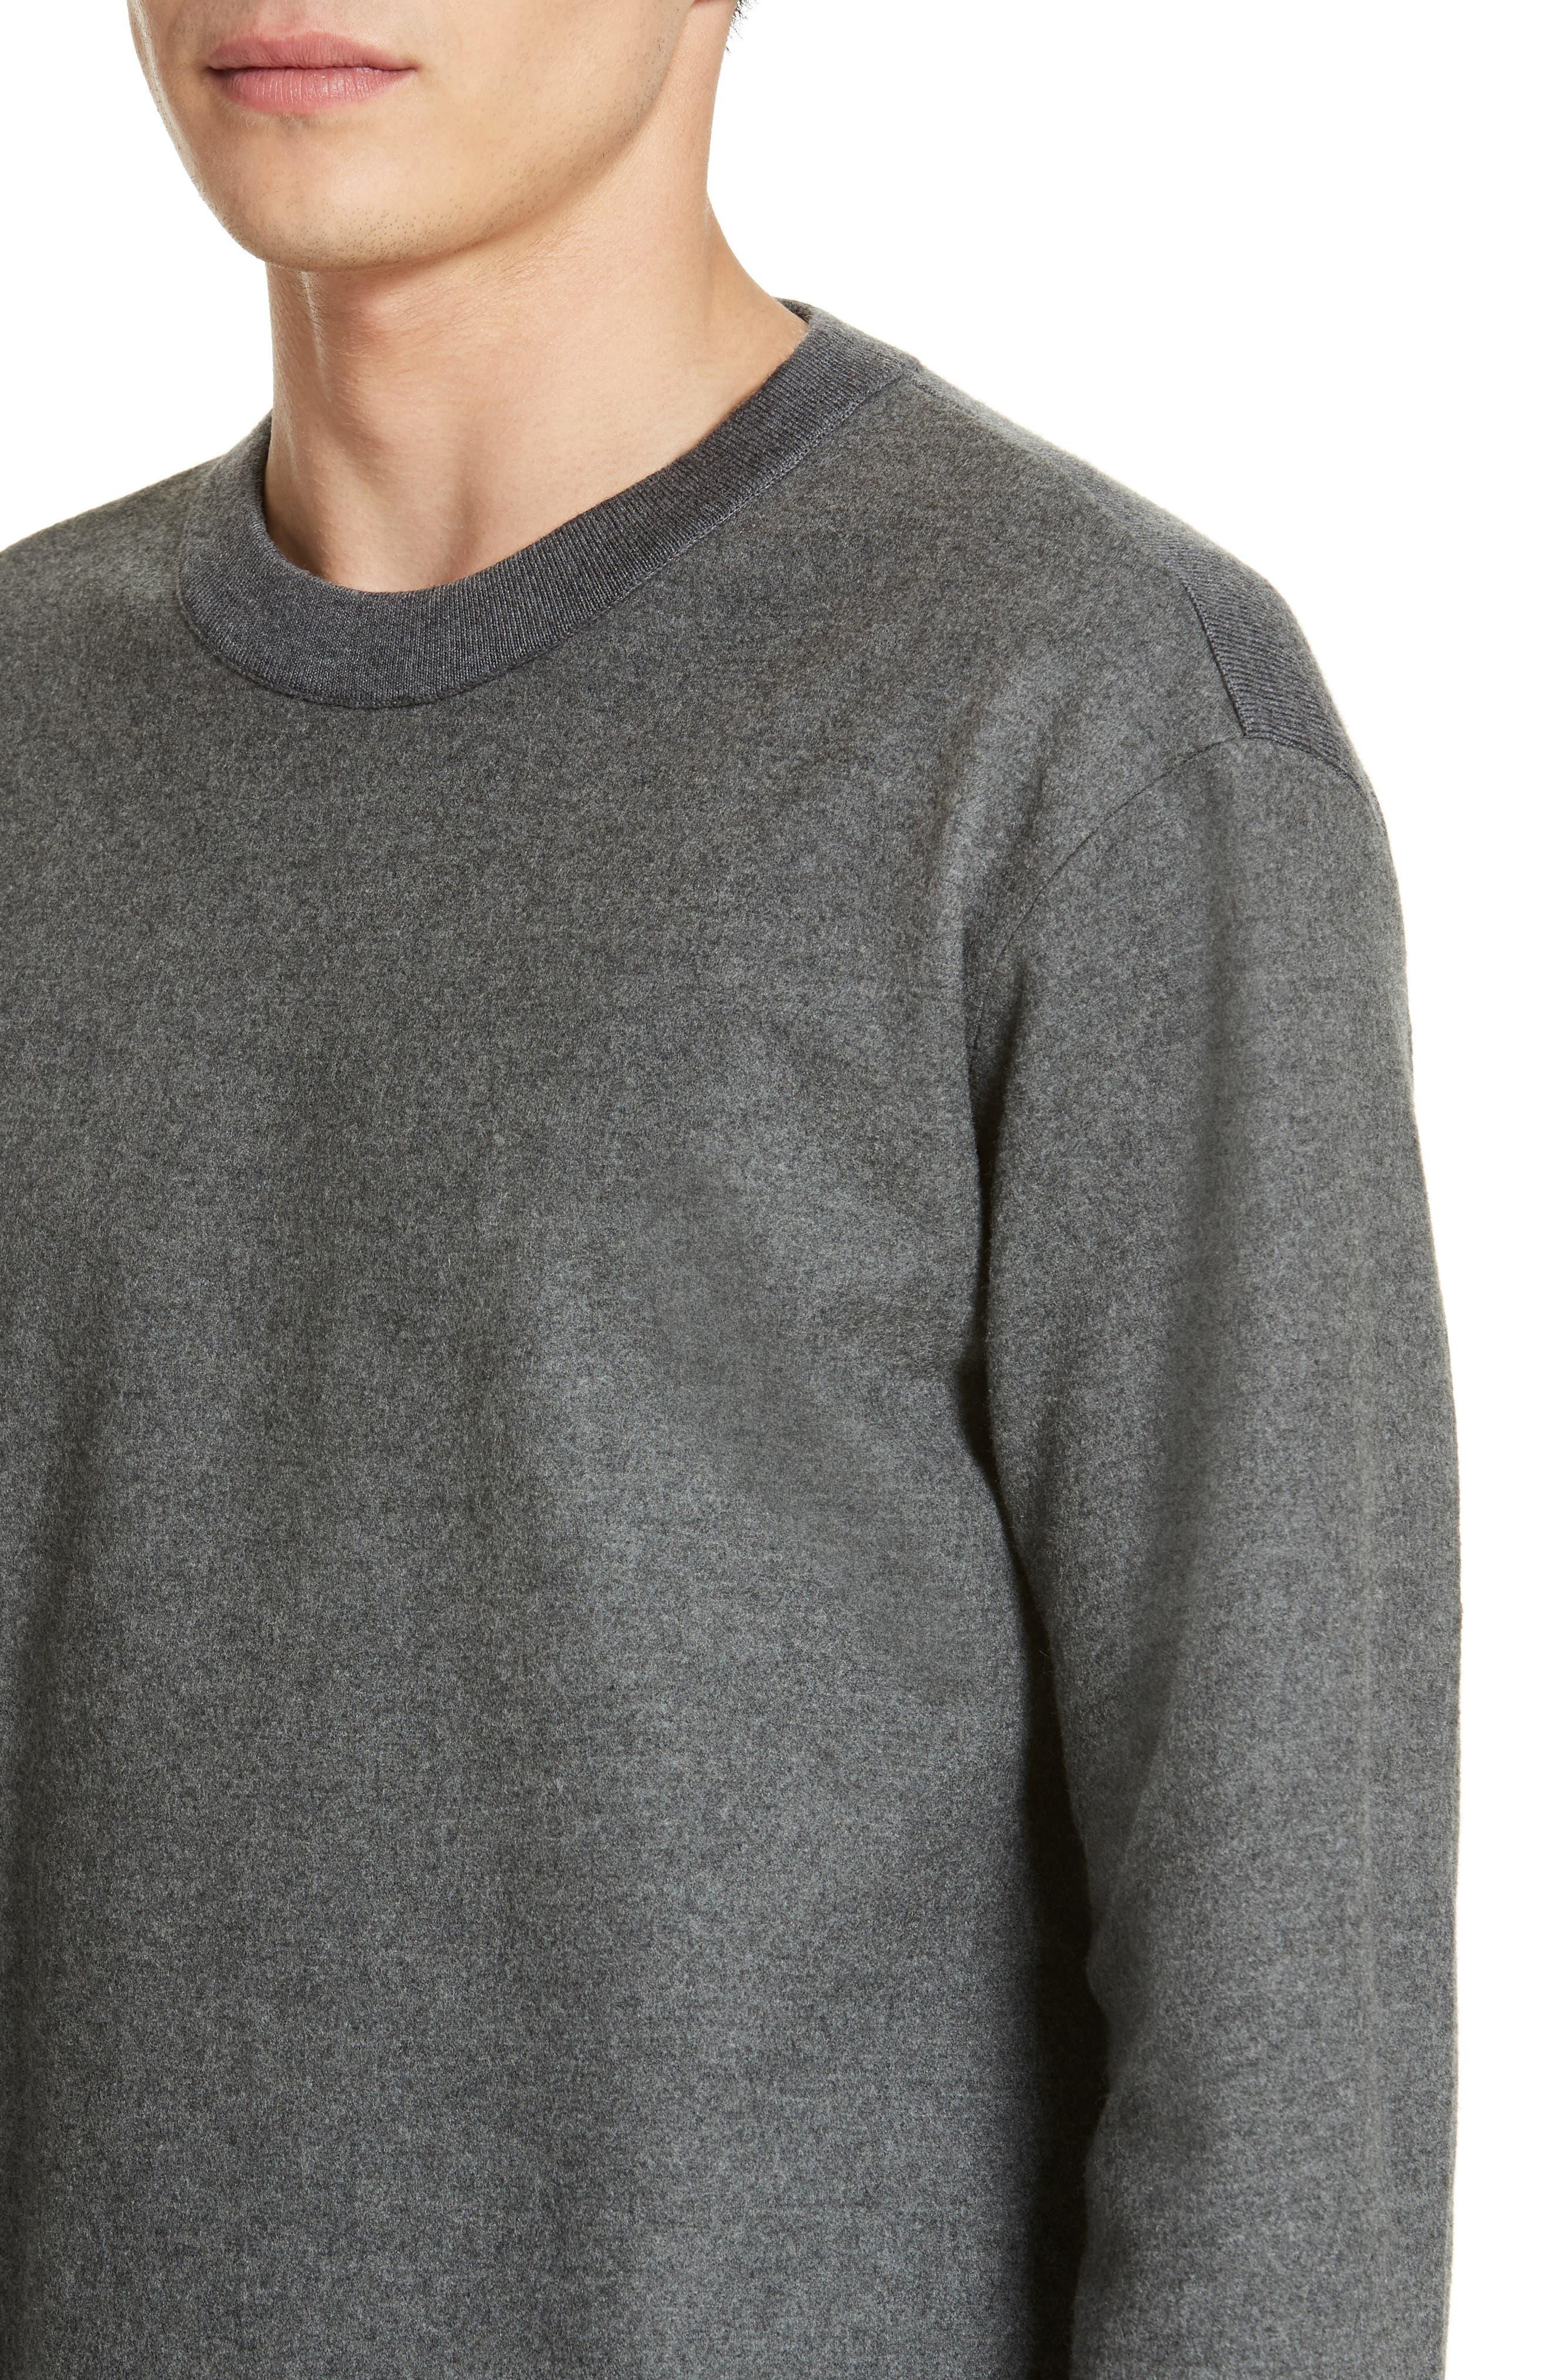 Hyper Compress Sweatshirt,                             Alternate thumbnail 4, color,